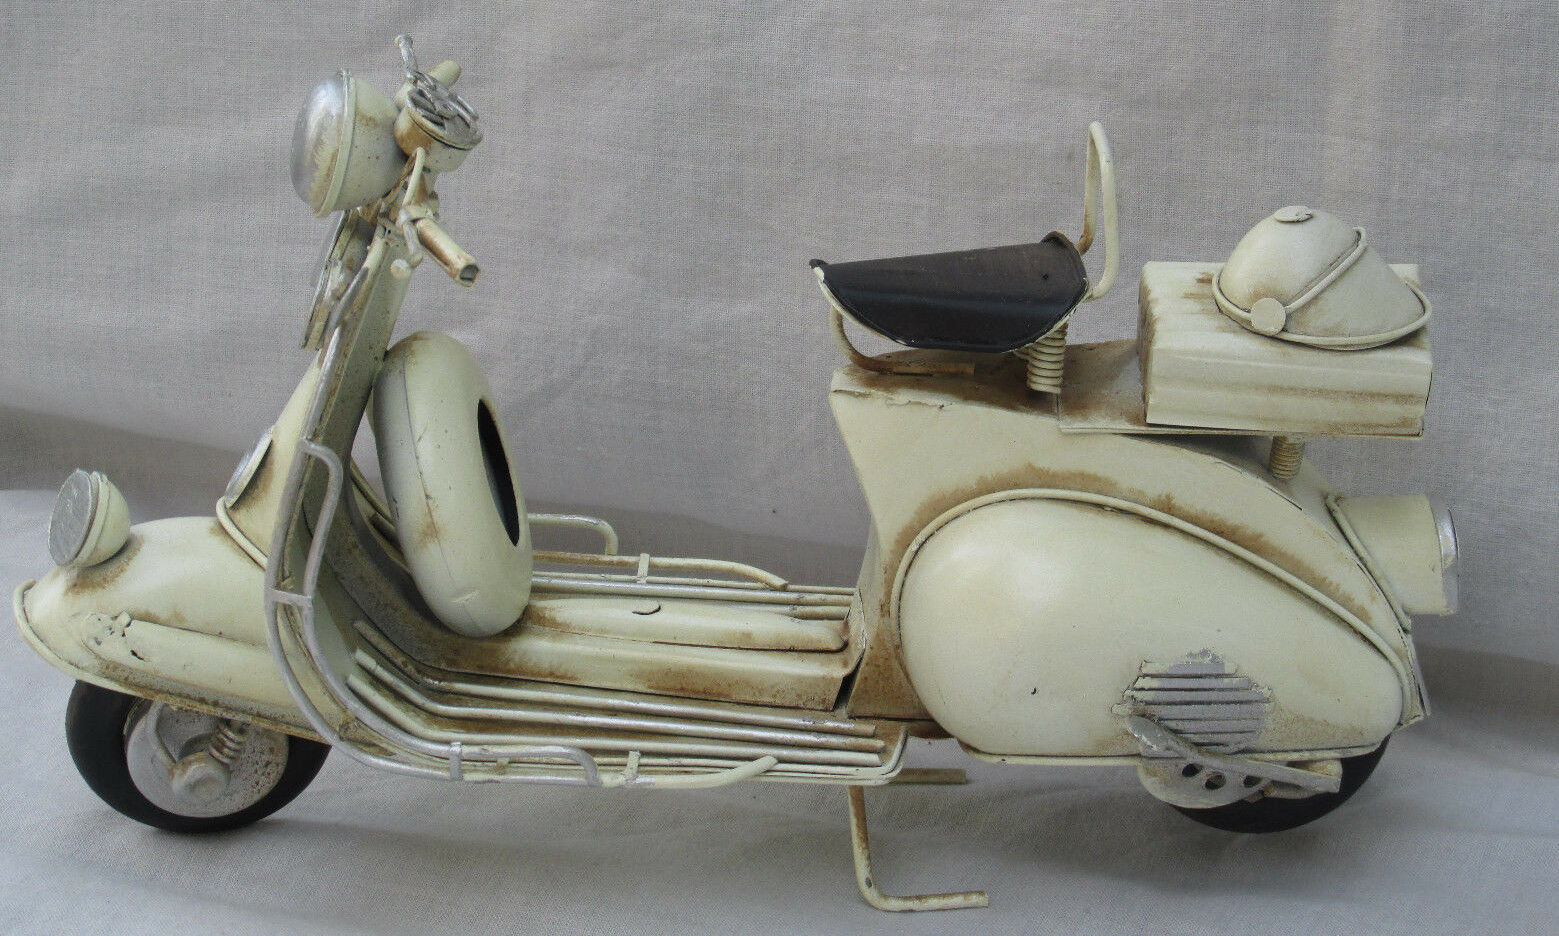 punto de venta Dgj 6011 metal - modelo de chapa modelo motor motor motor Roller scooter trozo de decoración  compras de moda online